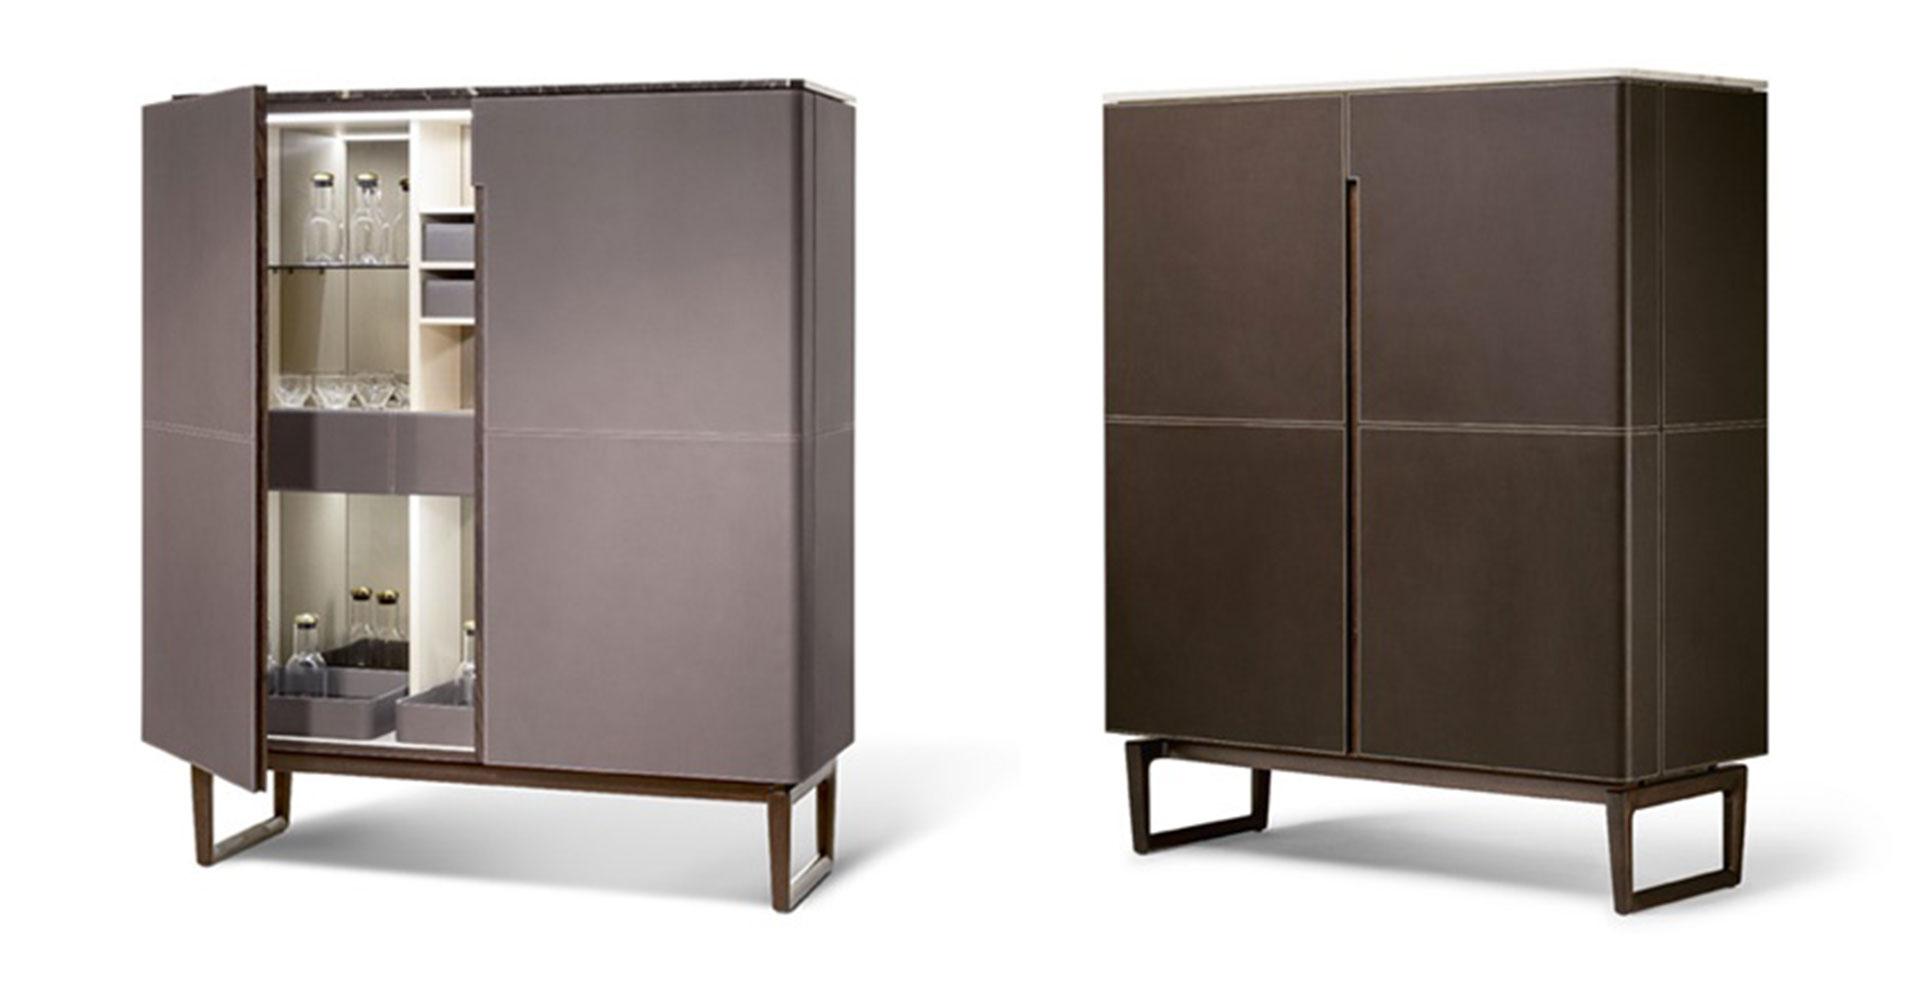 Fidelio Poltrona Frau - cupboard fidelio poltrona frau - bookcase ...